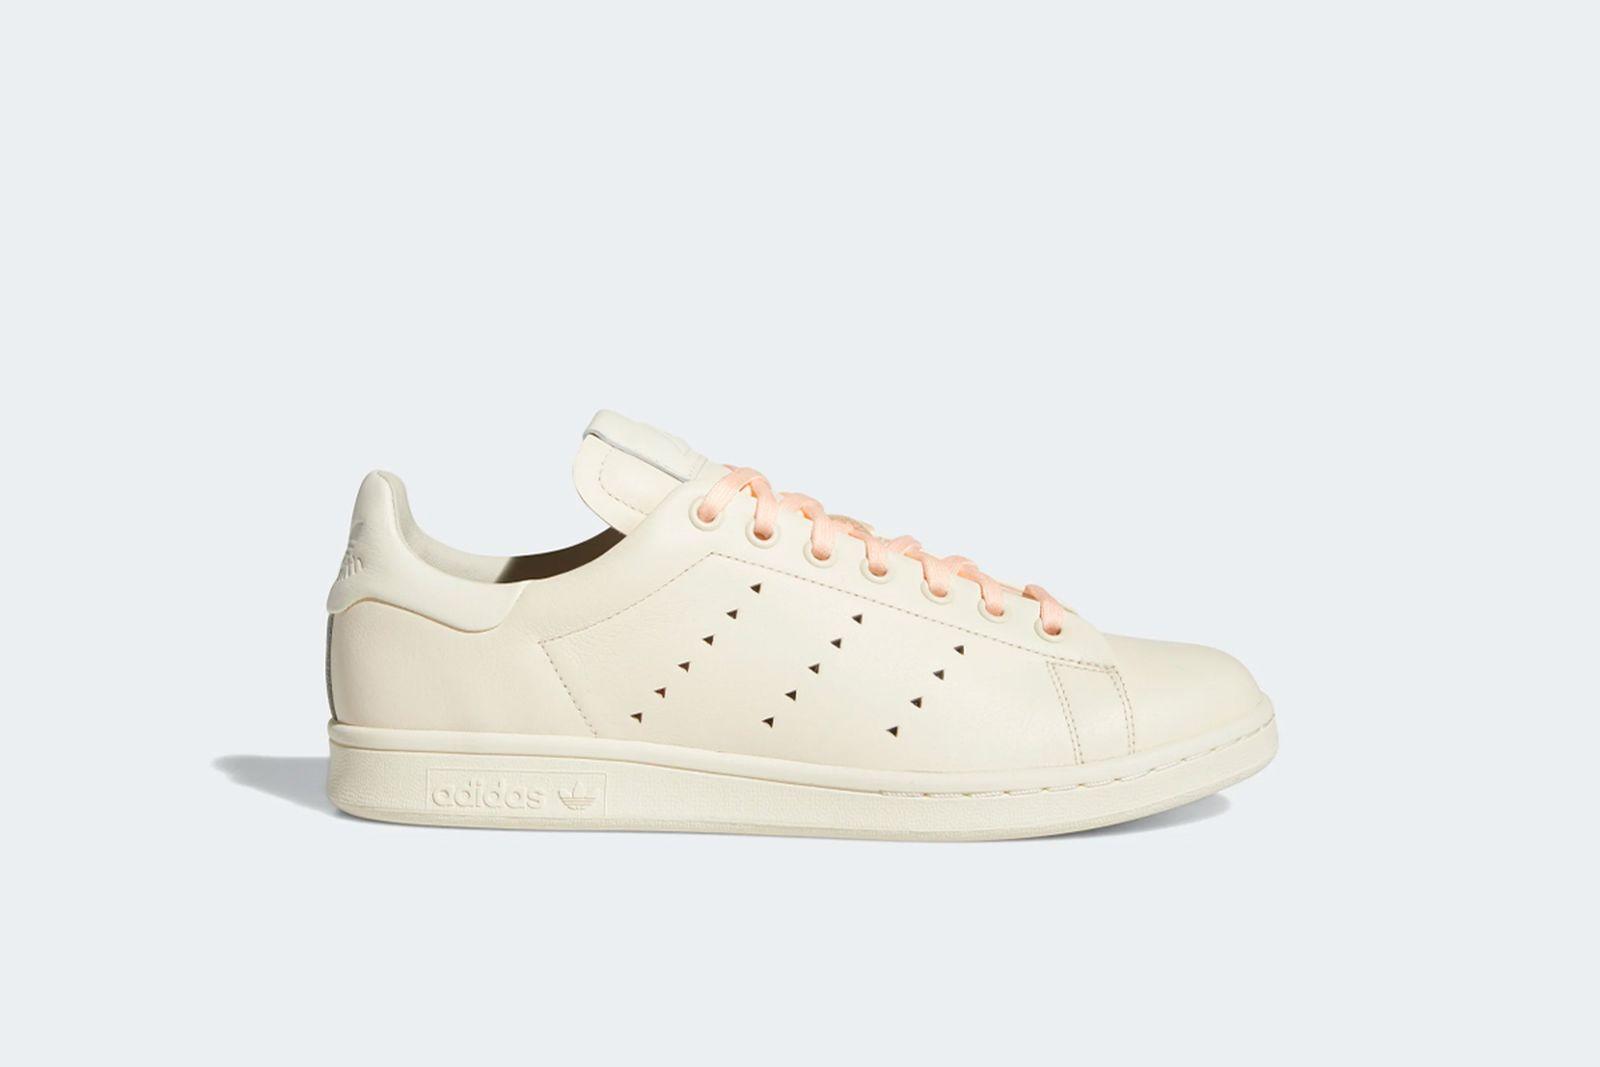 Pharrell Williams x Adidas 2020 Stan Smith Sneaker